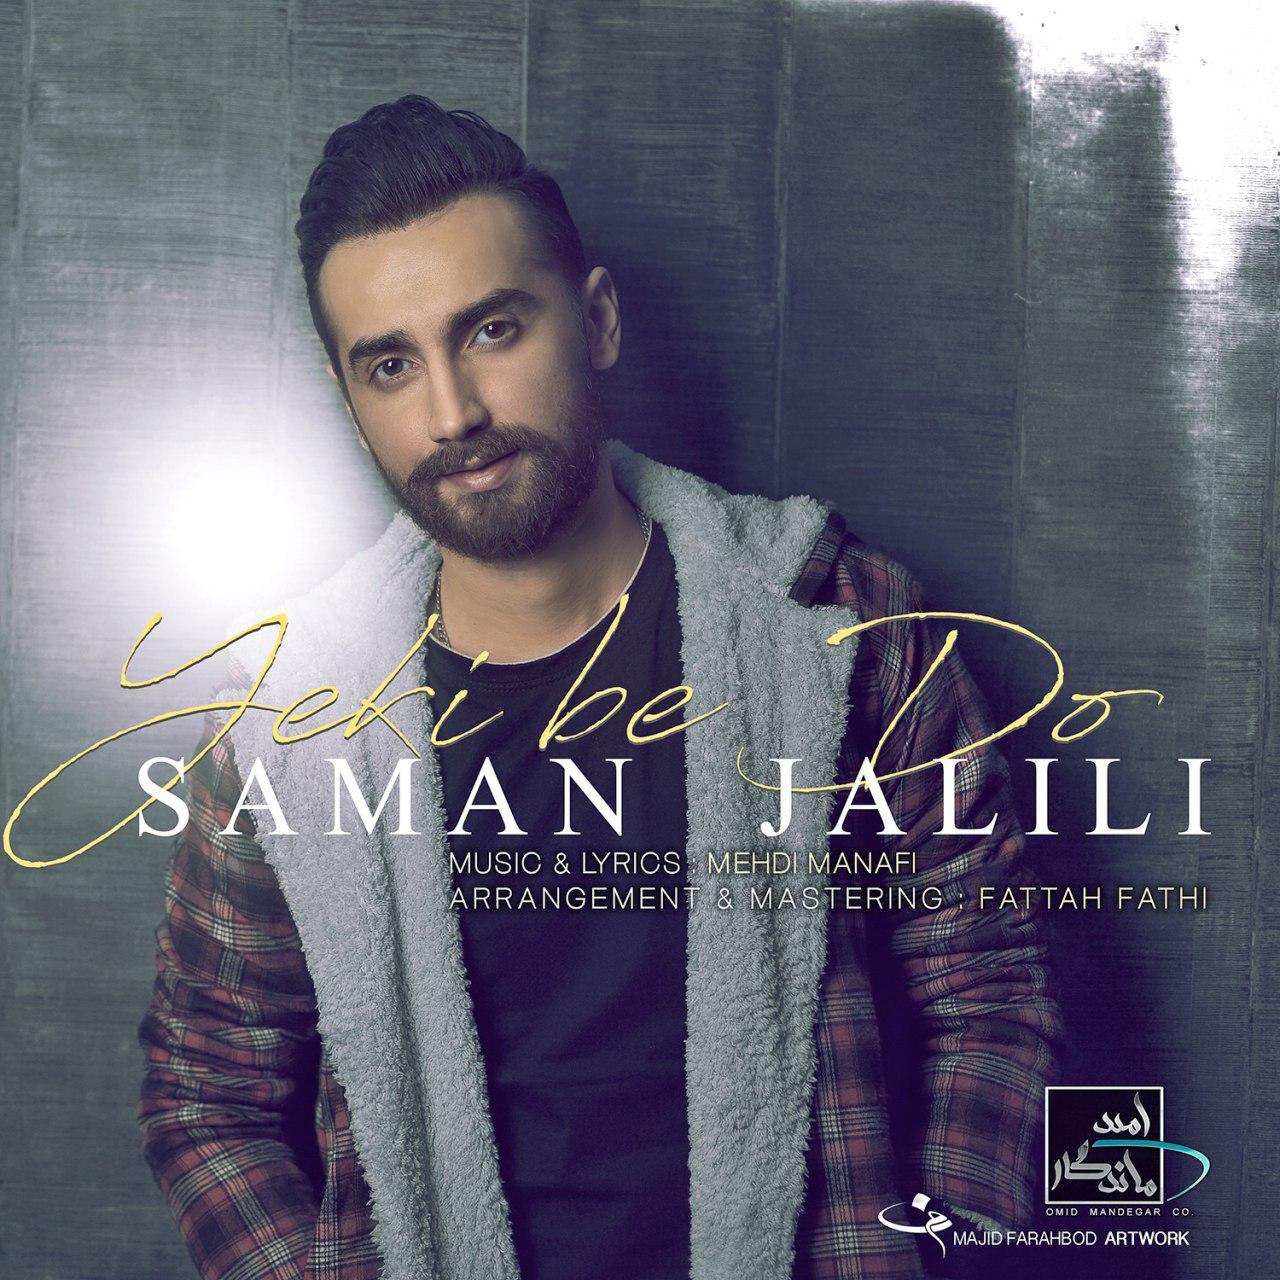 Saman Jalili - Yeki Be Do Music | آهنگ سامان جلیلی - یکی به دو